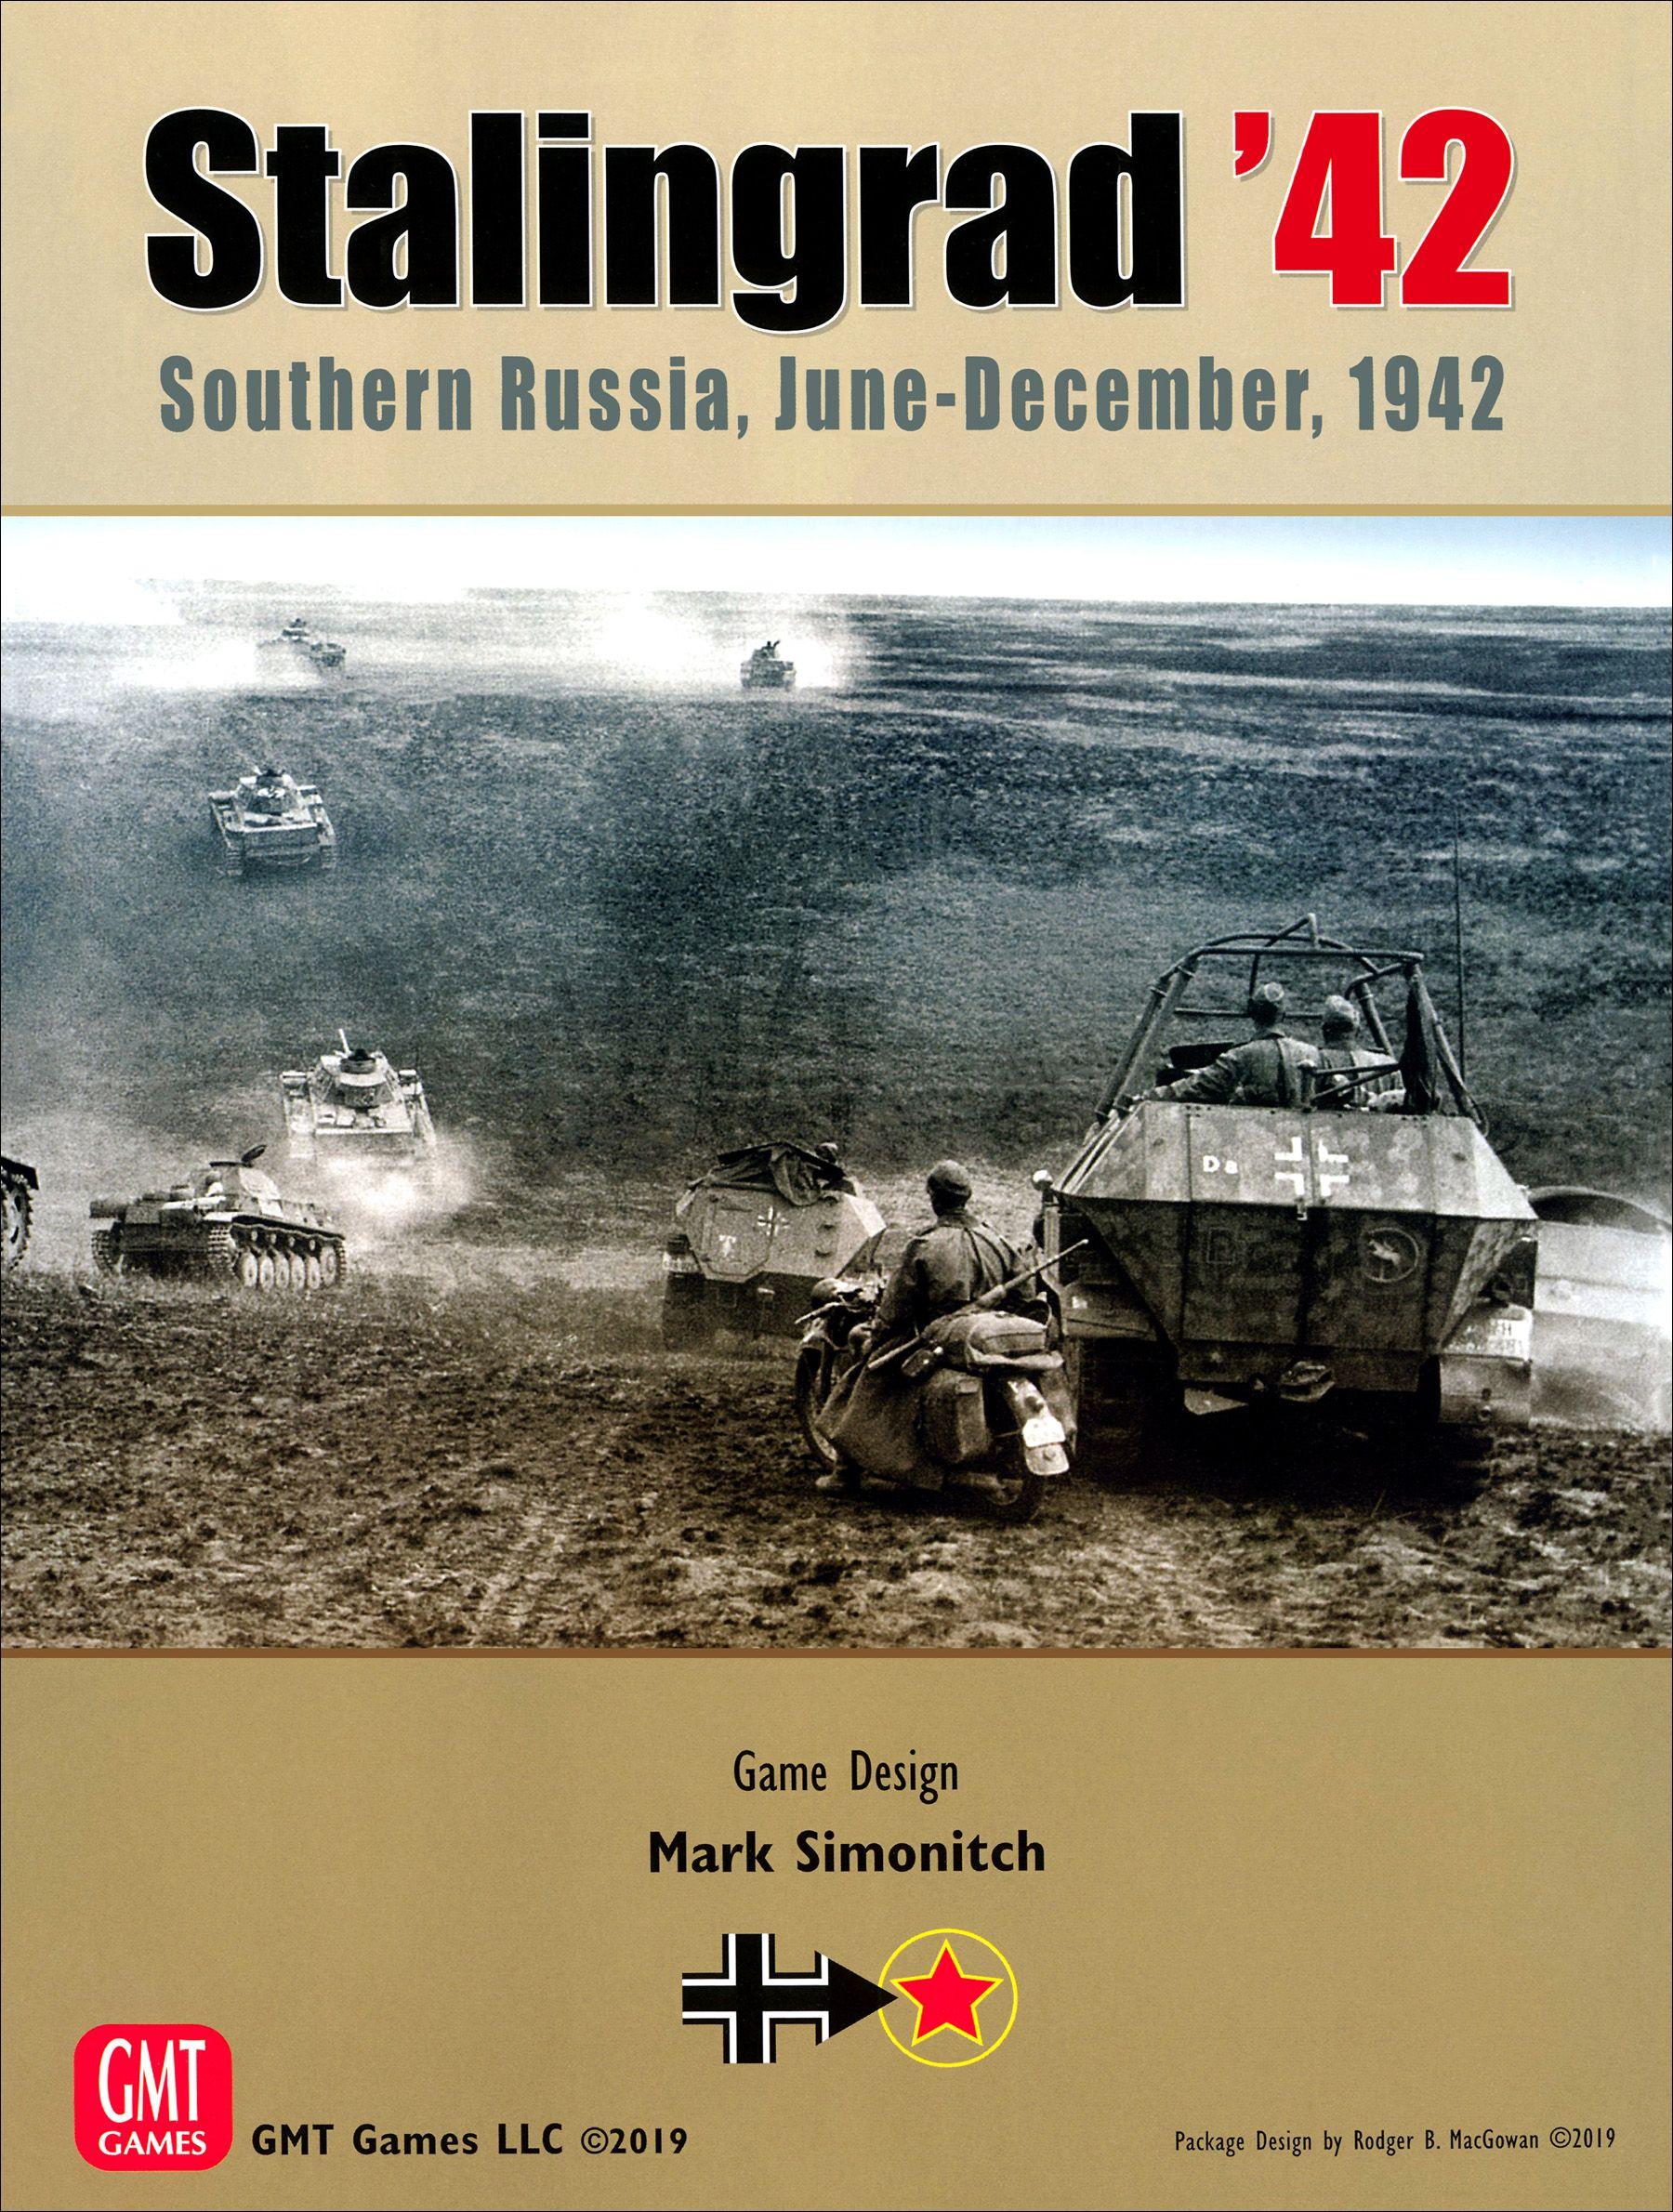 Stalingrad '42: Southern Russia, June-December, 1942